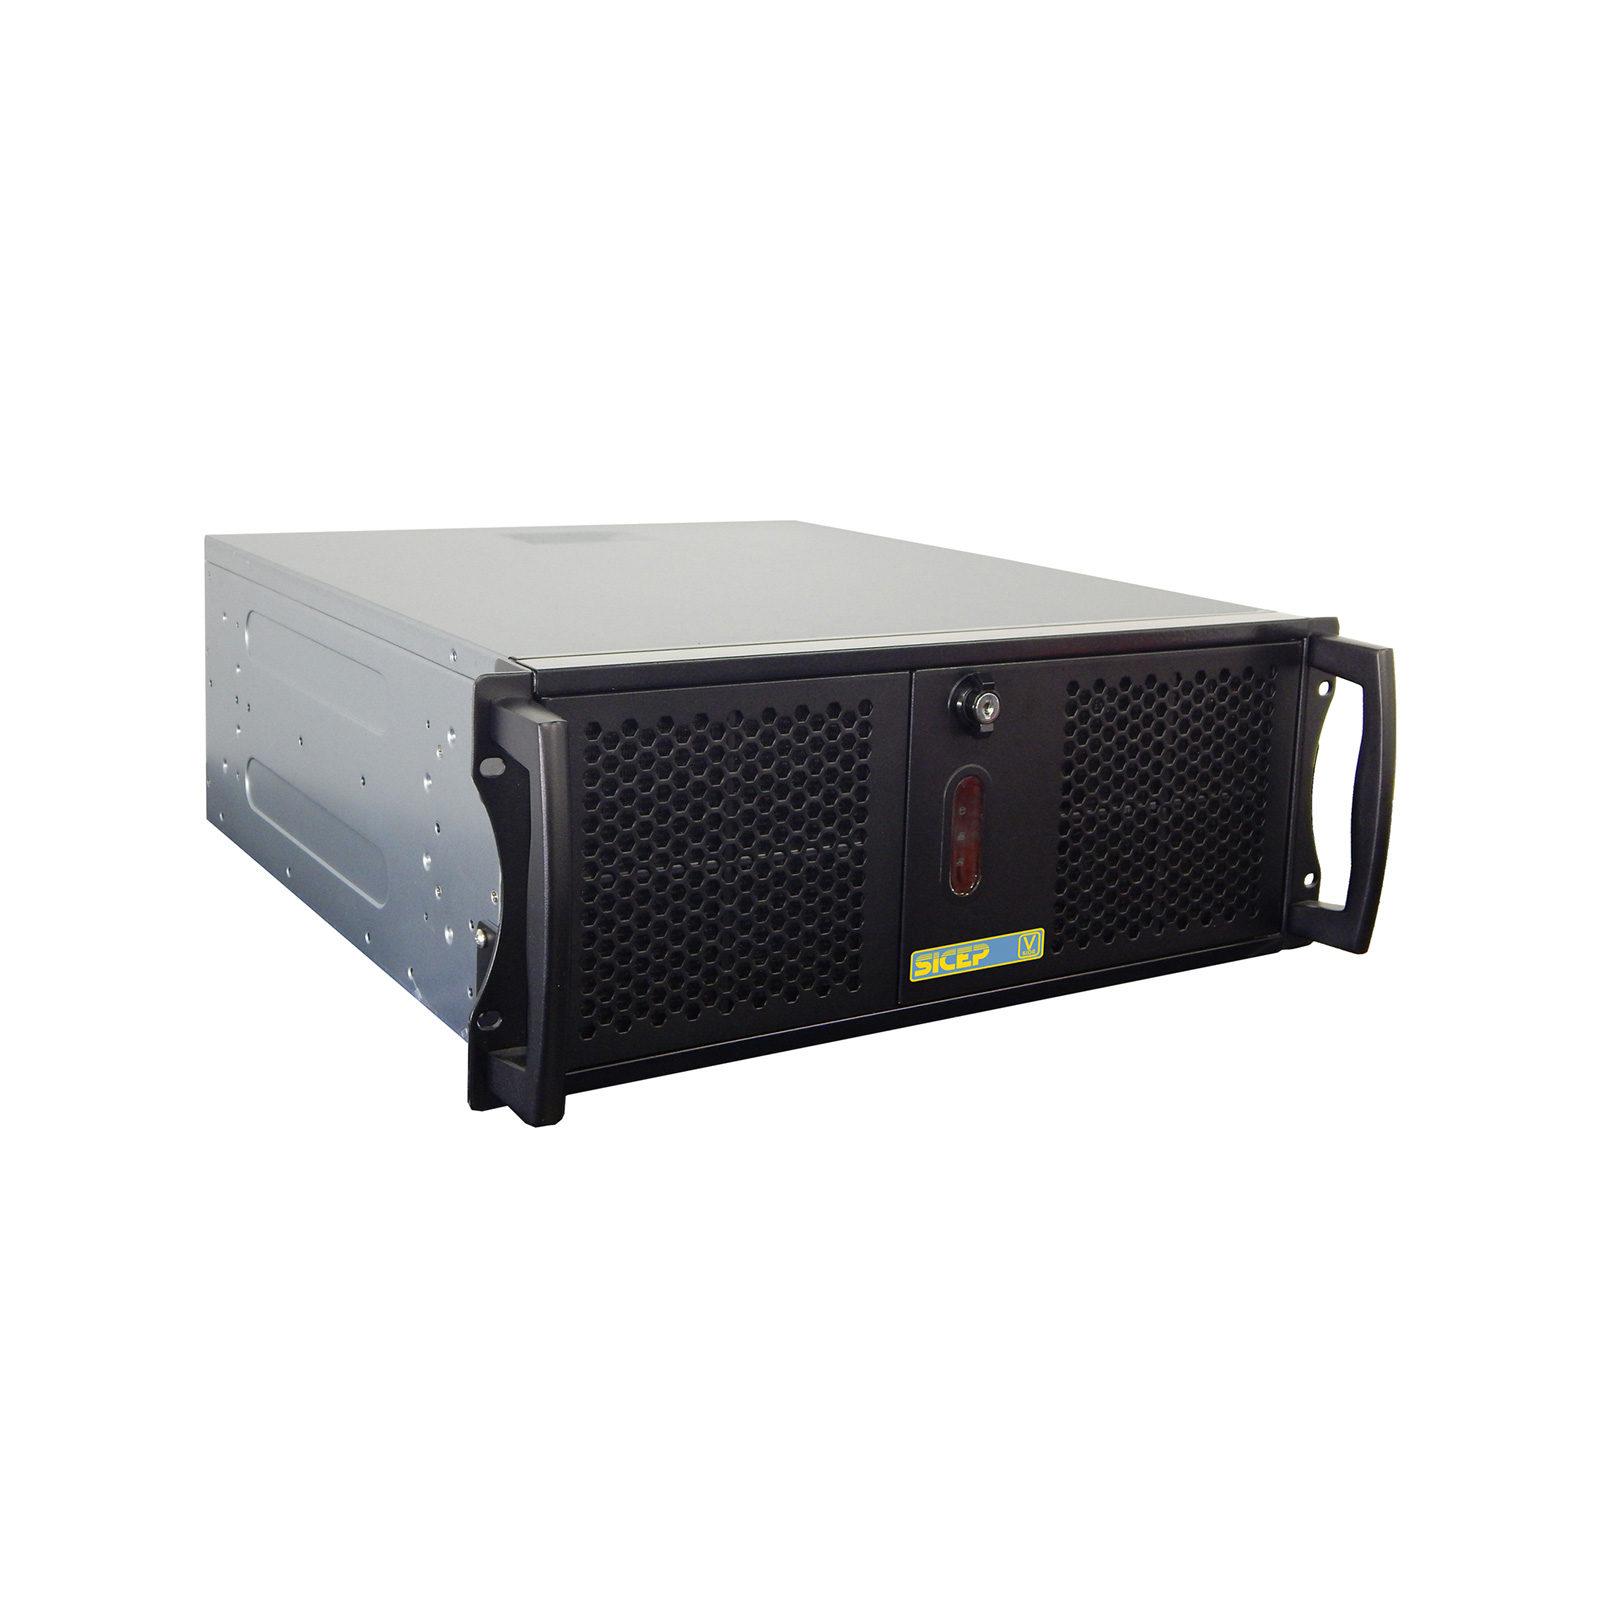 server-in-rack-4-unita-gestione-5000-dispositivi